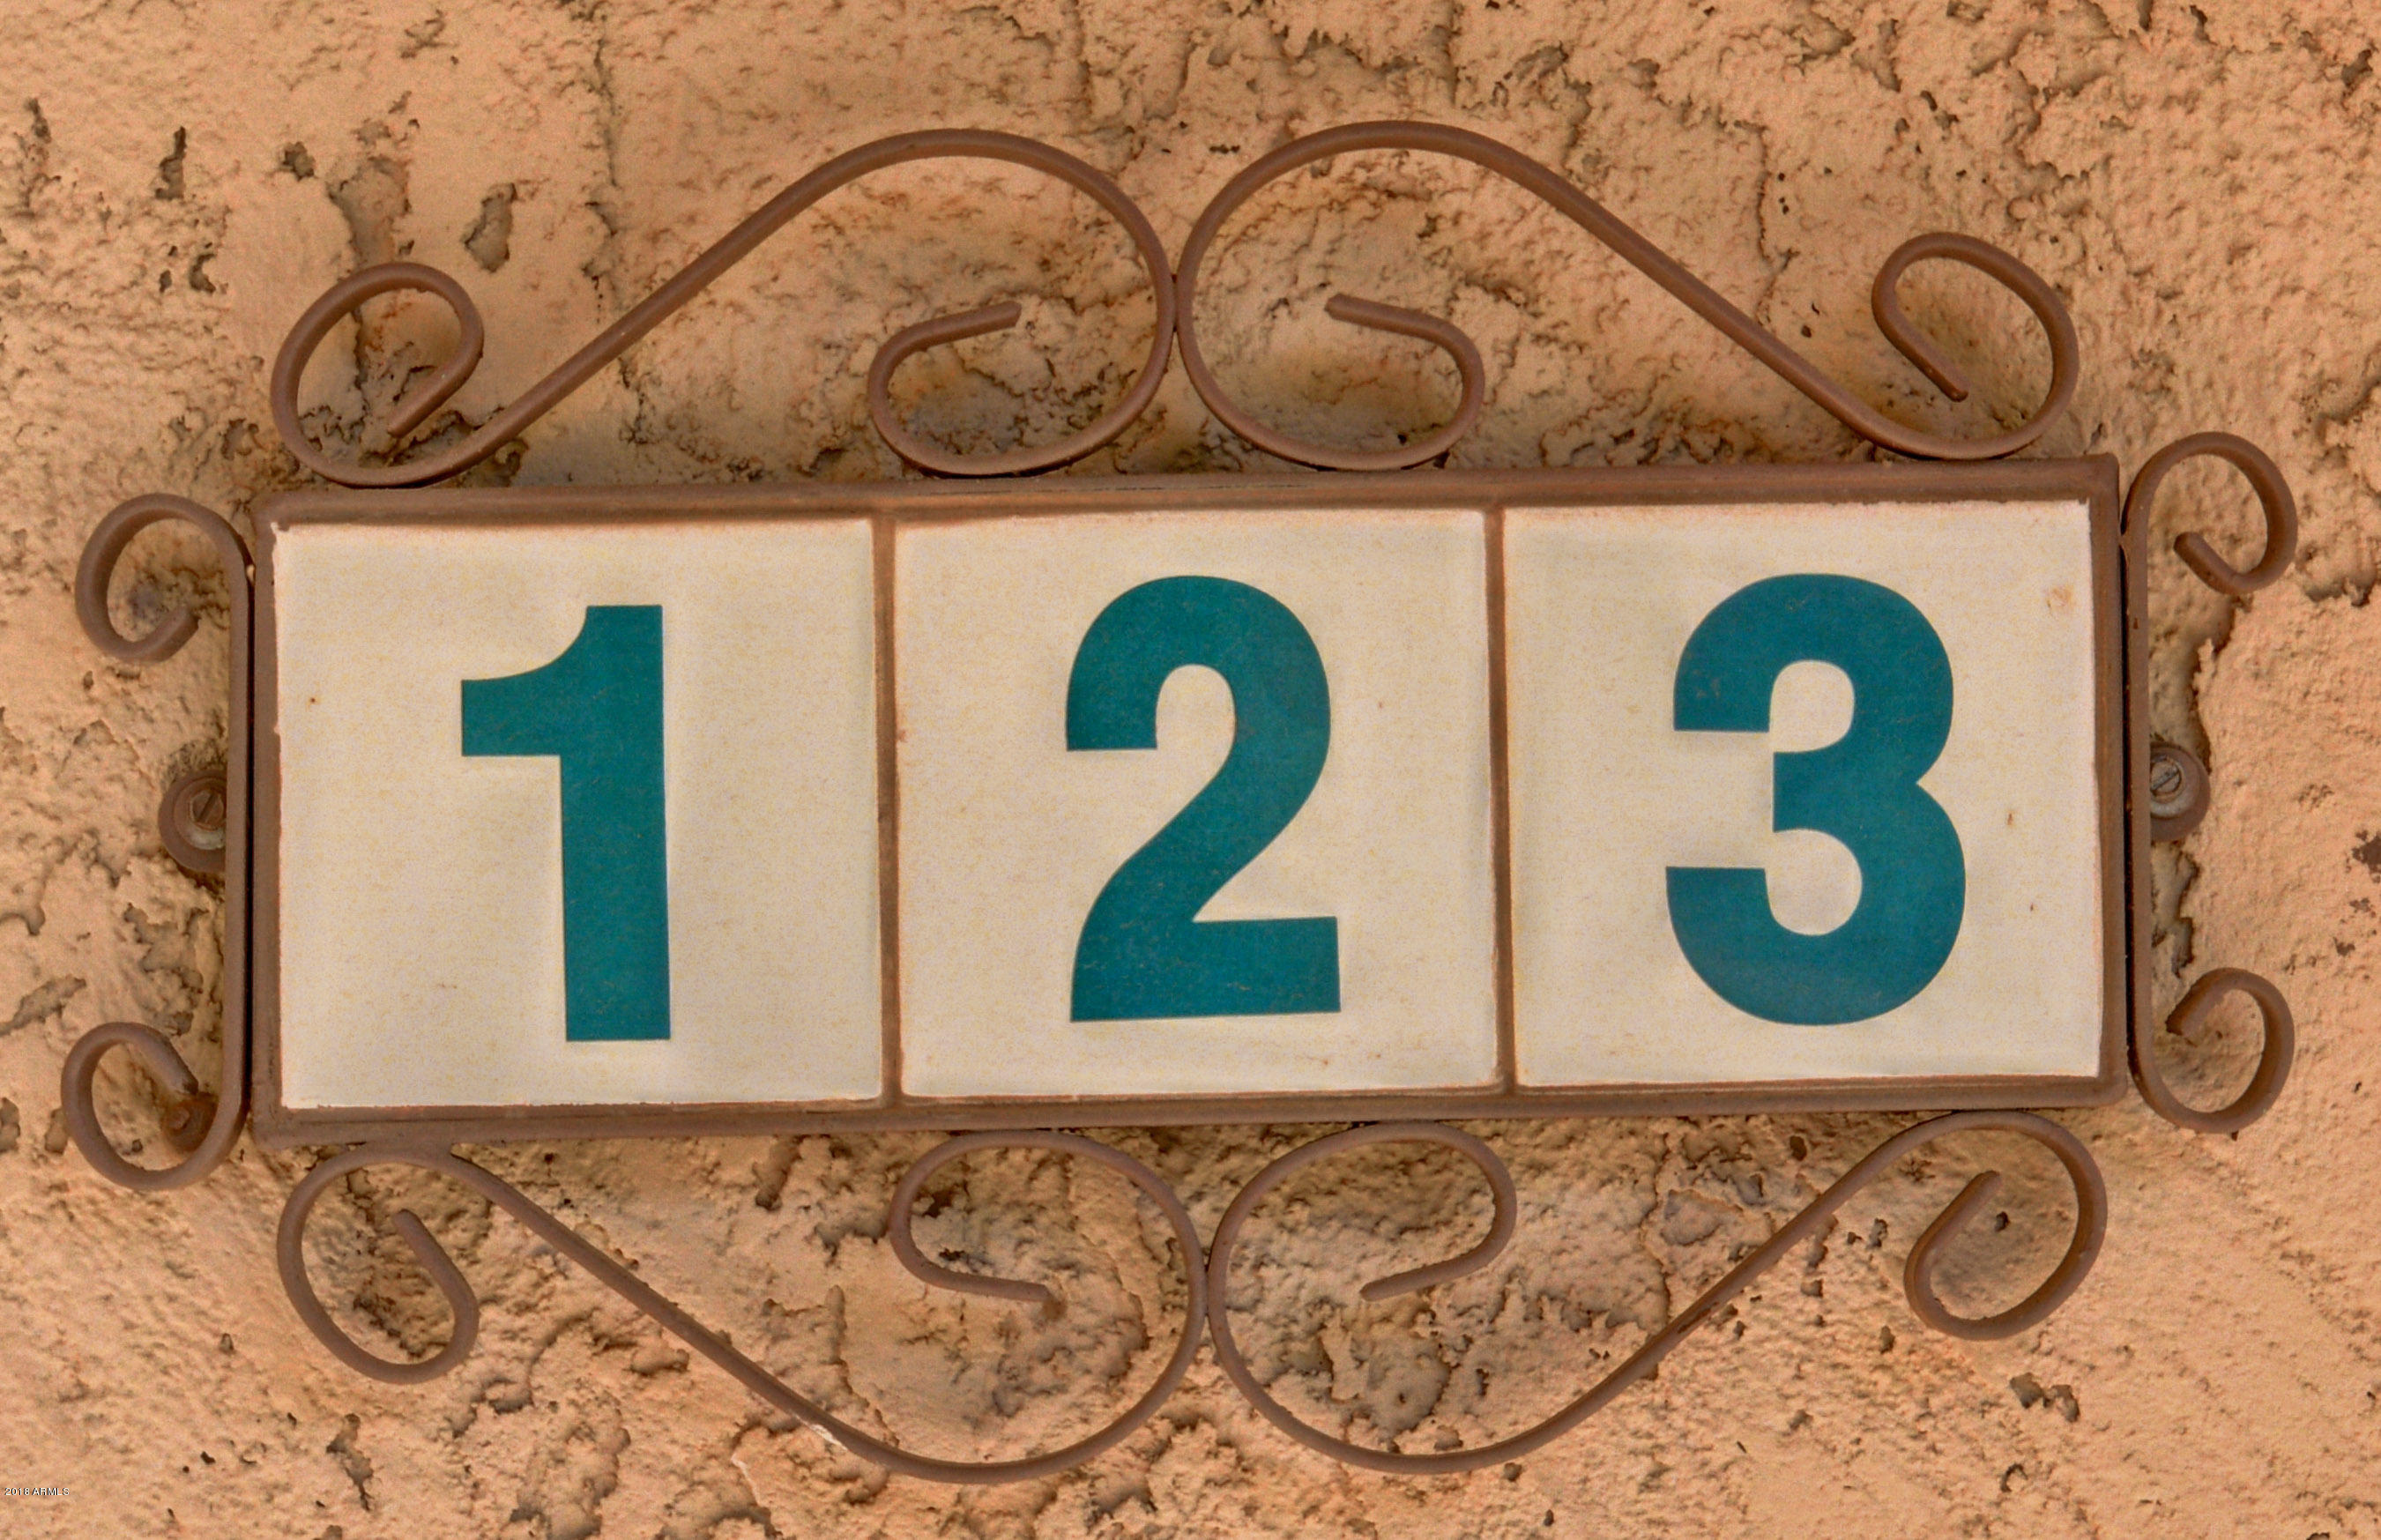 MLS 5834399 3314 N 68TH Street Unit 123, Scottsdale, AZ 85251 Scottsdale AZ Old Town Scottsdale